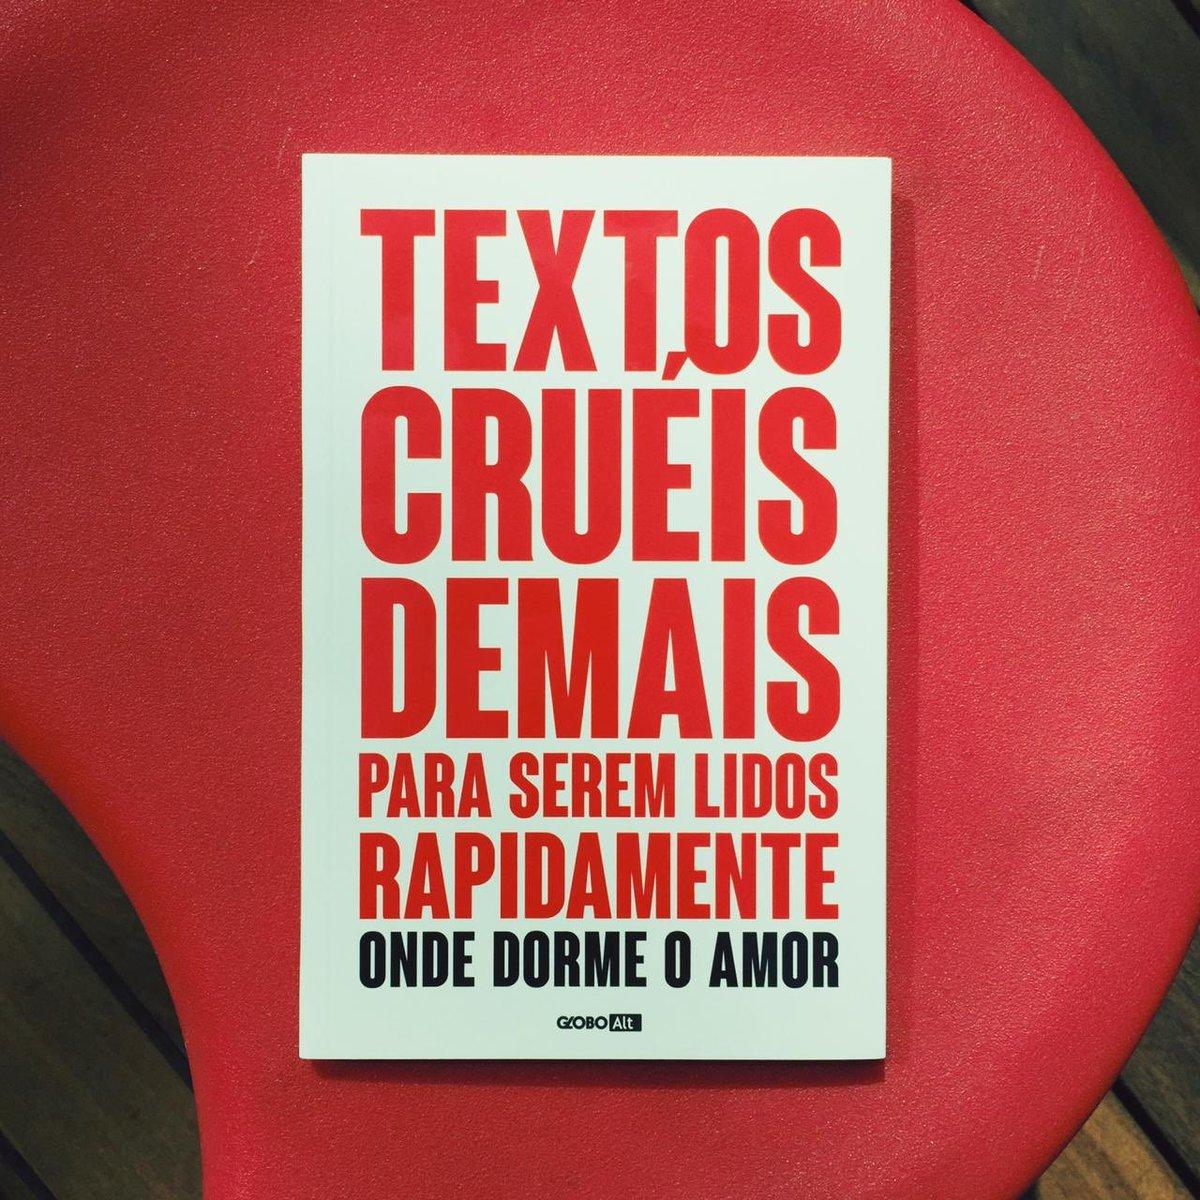 Textos Cruéis Demais Onde Dorme O Amor At Textoscrueis Twitter